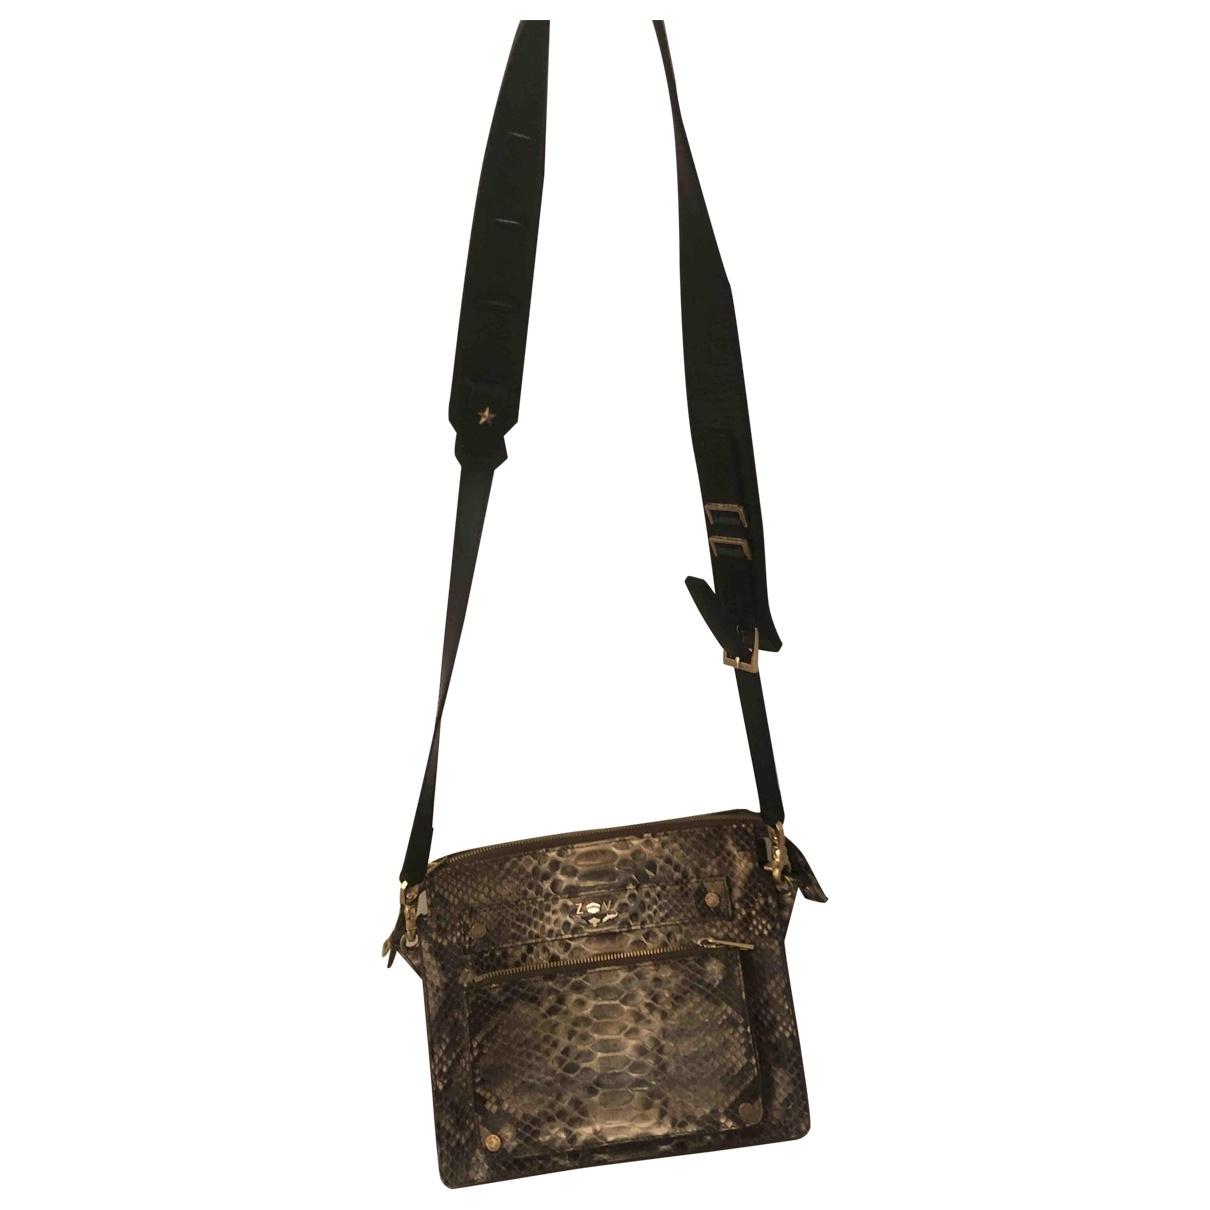 Zadig & Voltaire \N Multicolour Leather handbag for Women \N